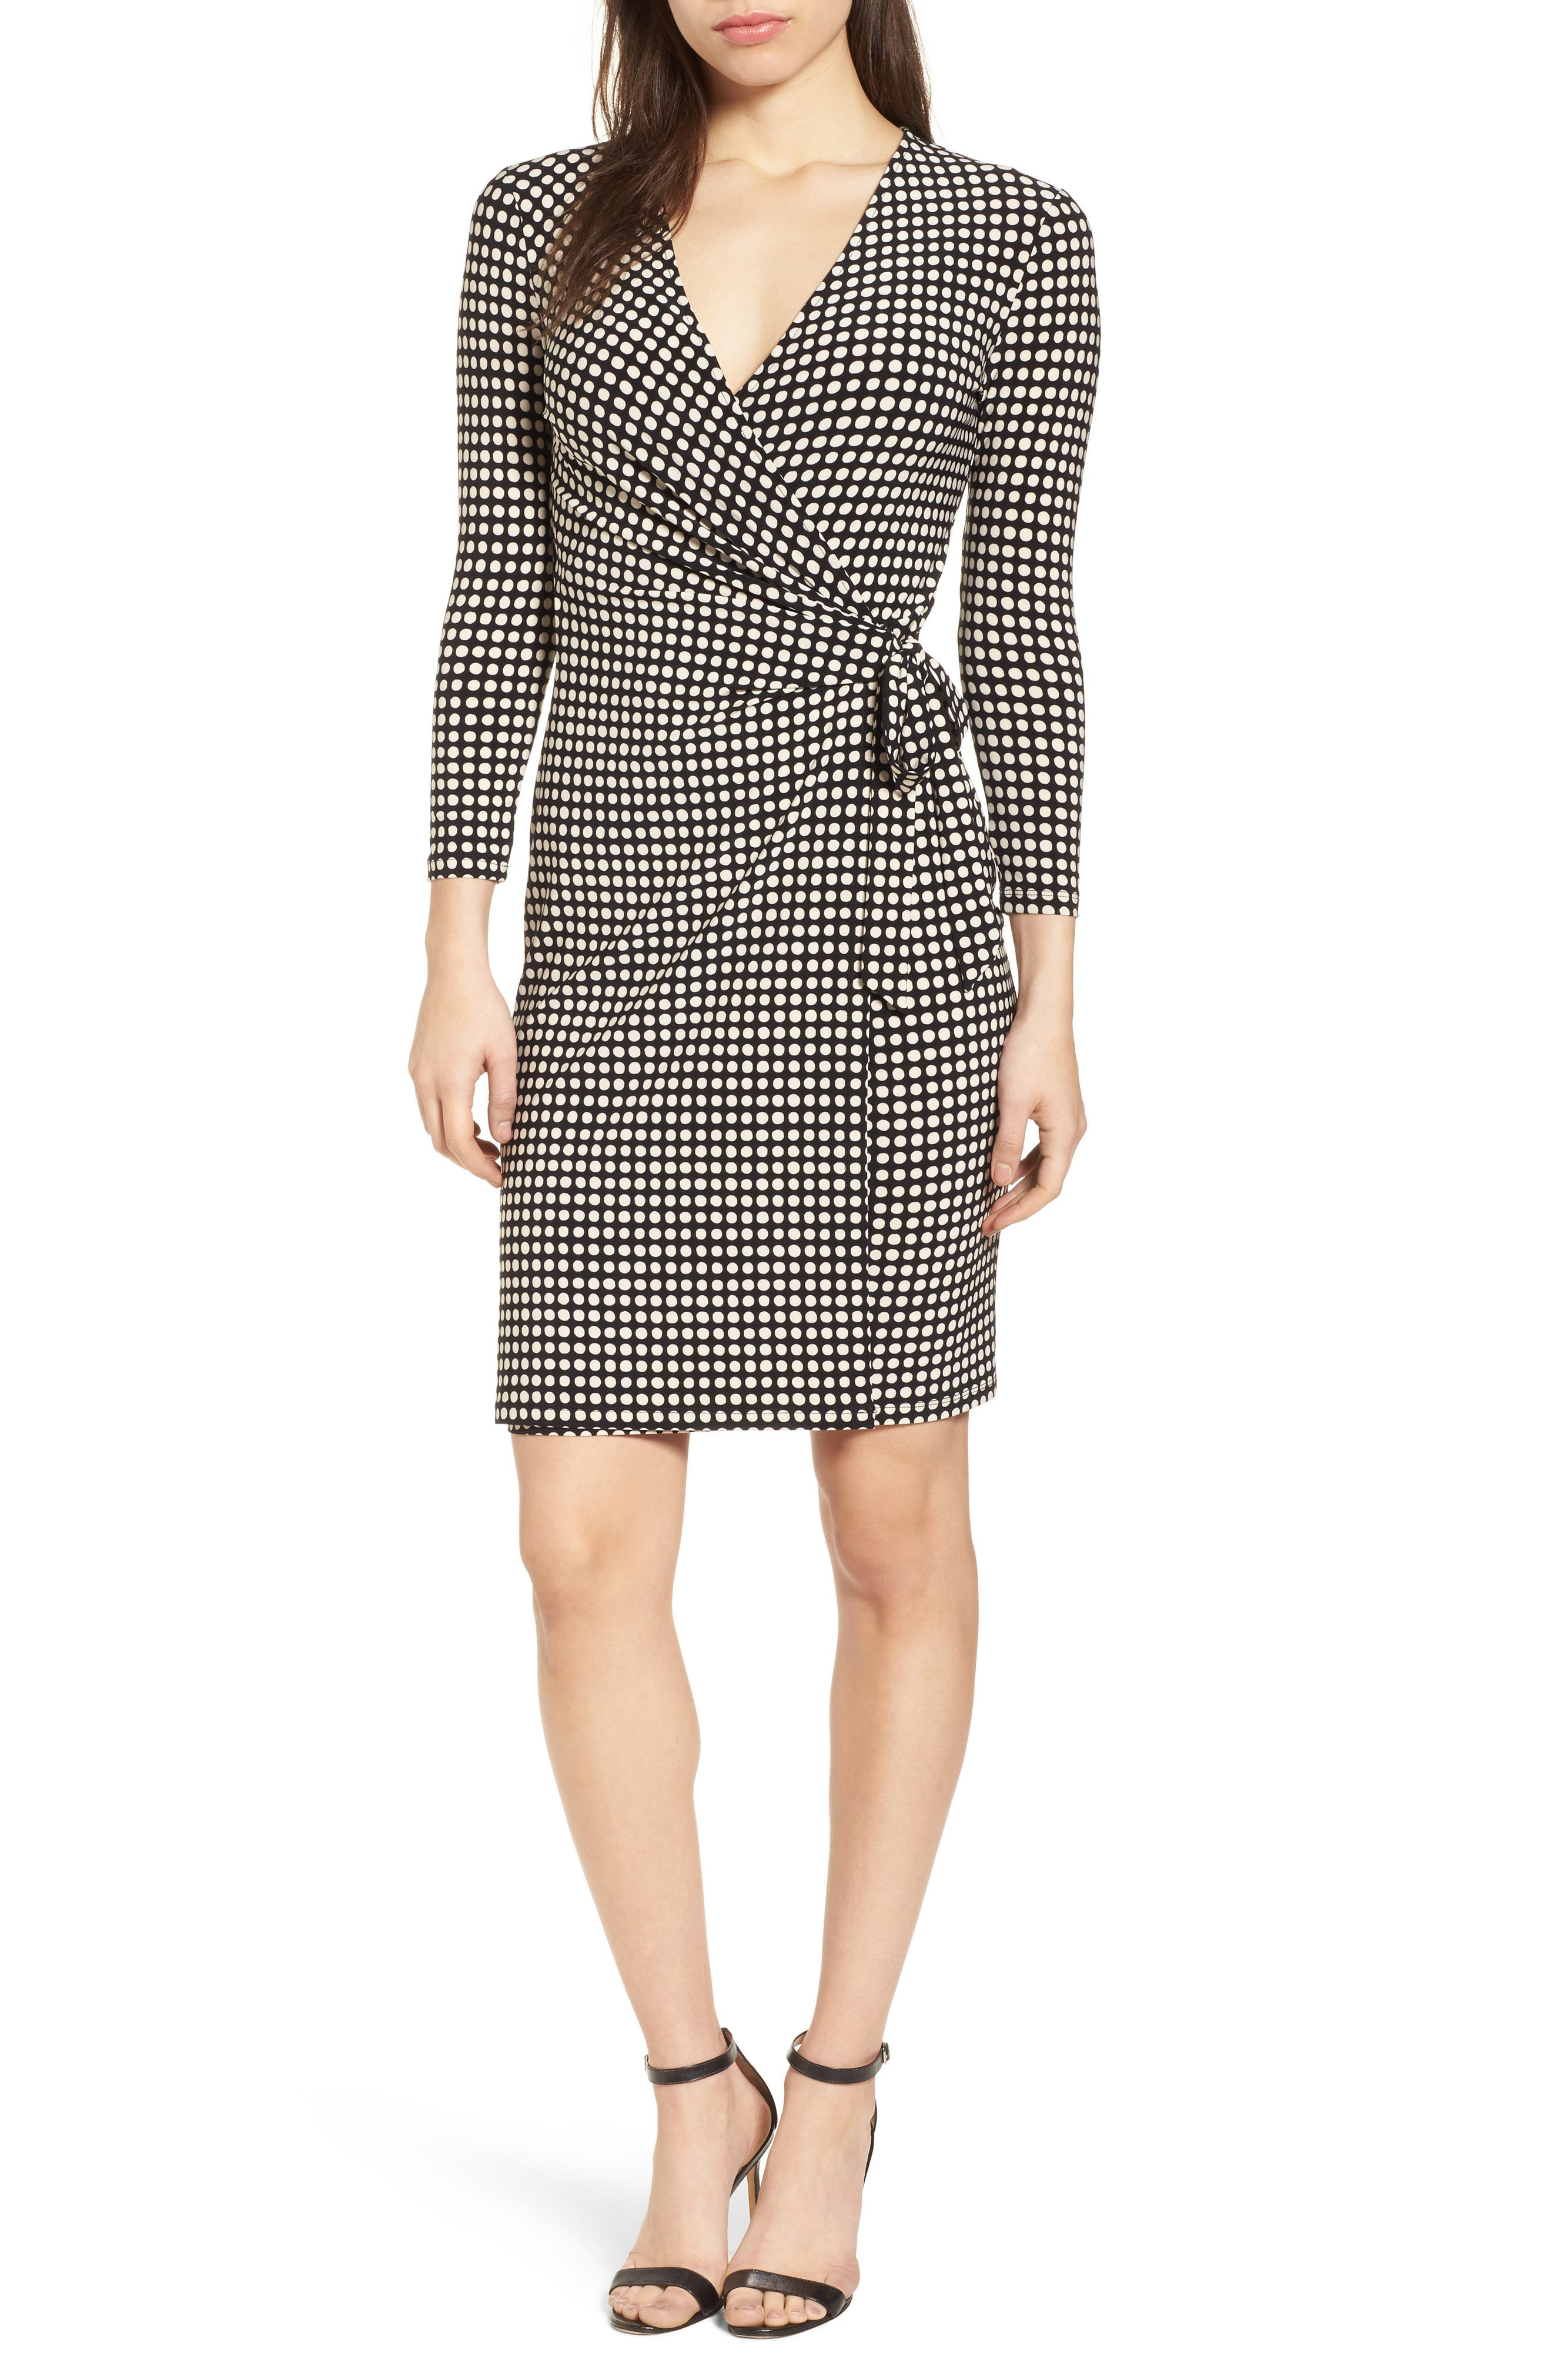 New York Pearly Dot Classic Wrap Dress,                             Main thumbnail 1, color,                             Black/ Parchment